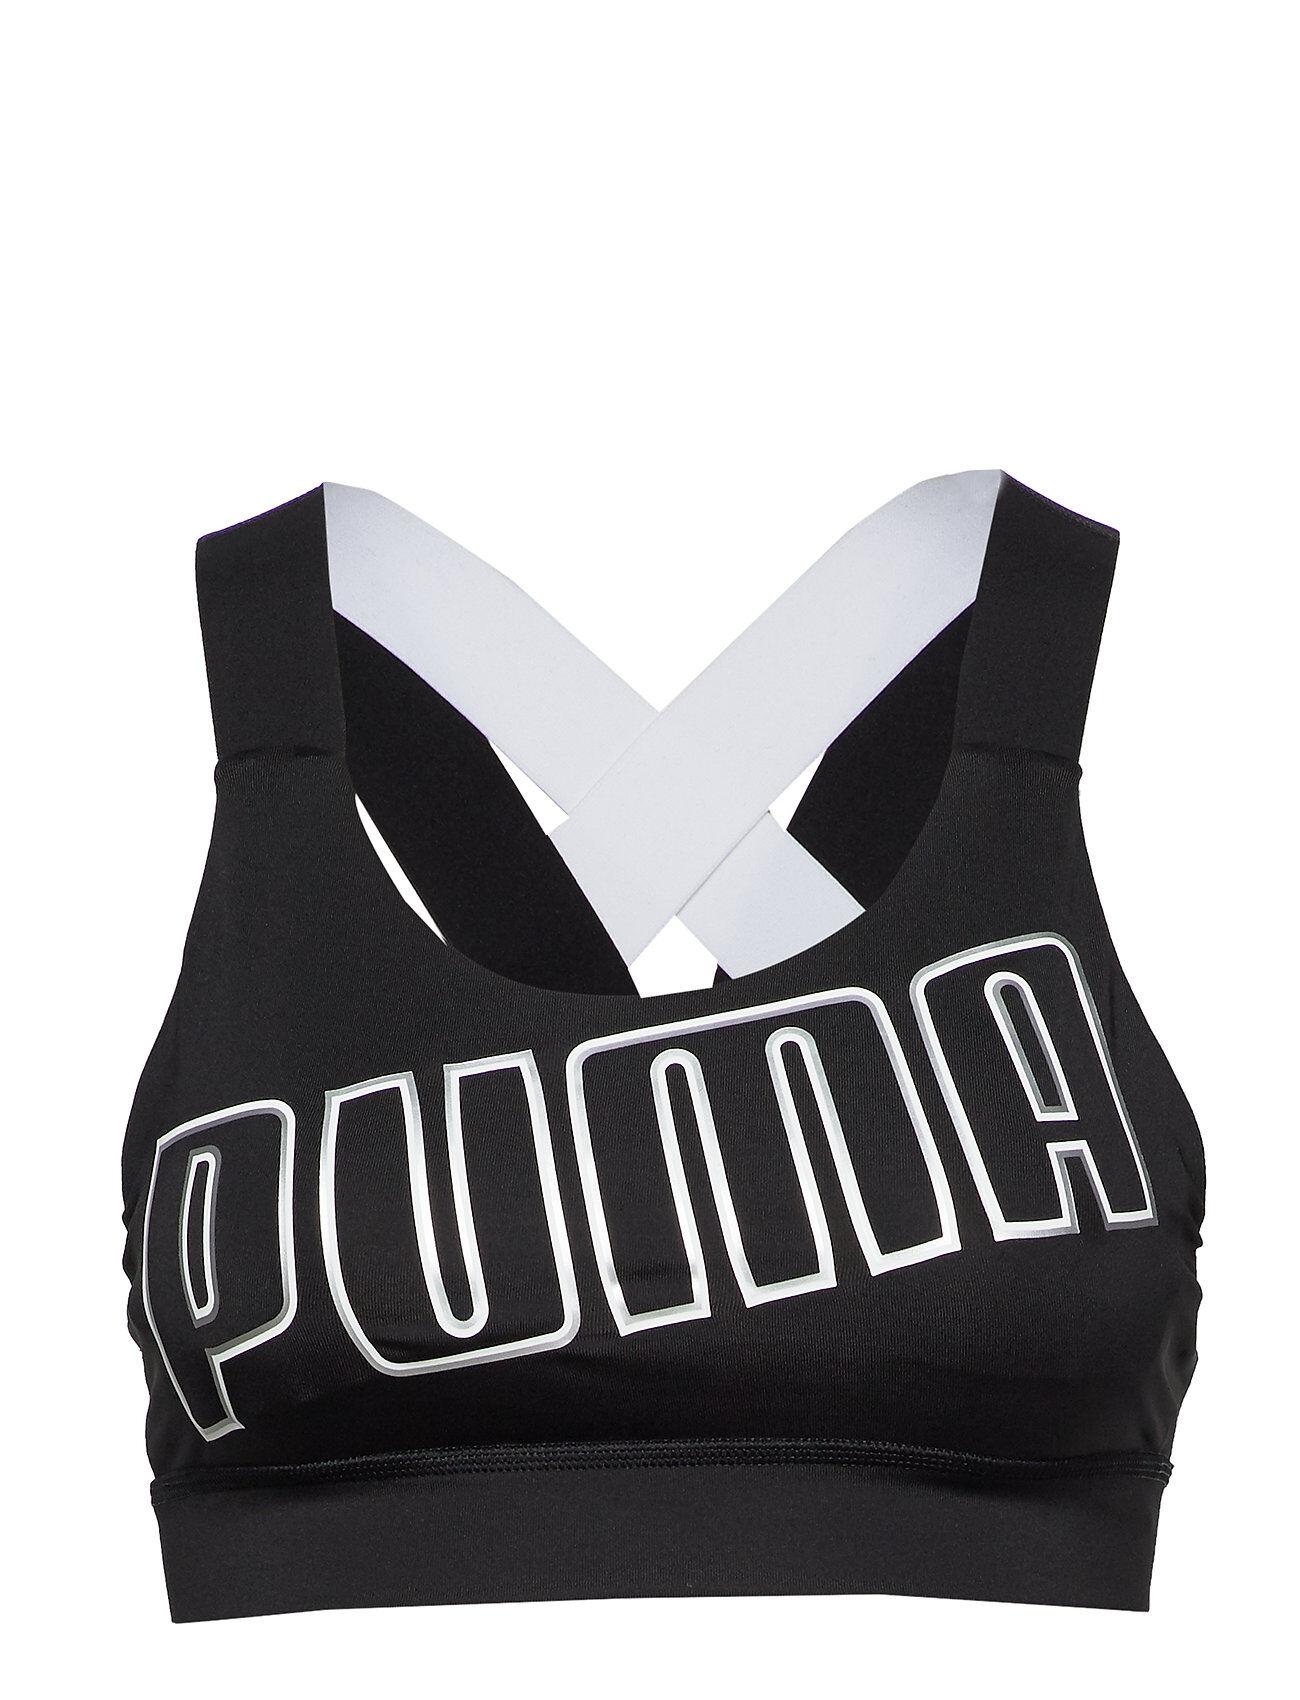 Image of PUMA Feel It Bra M Lingerie Bras & Tops Sports Bras - ALL Musta PUMA